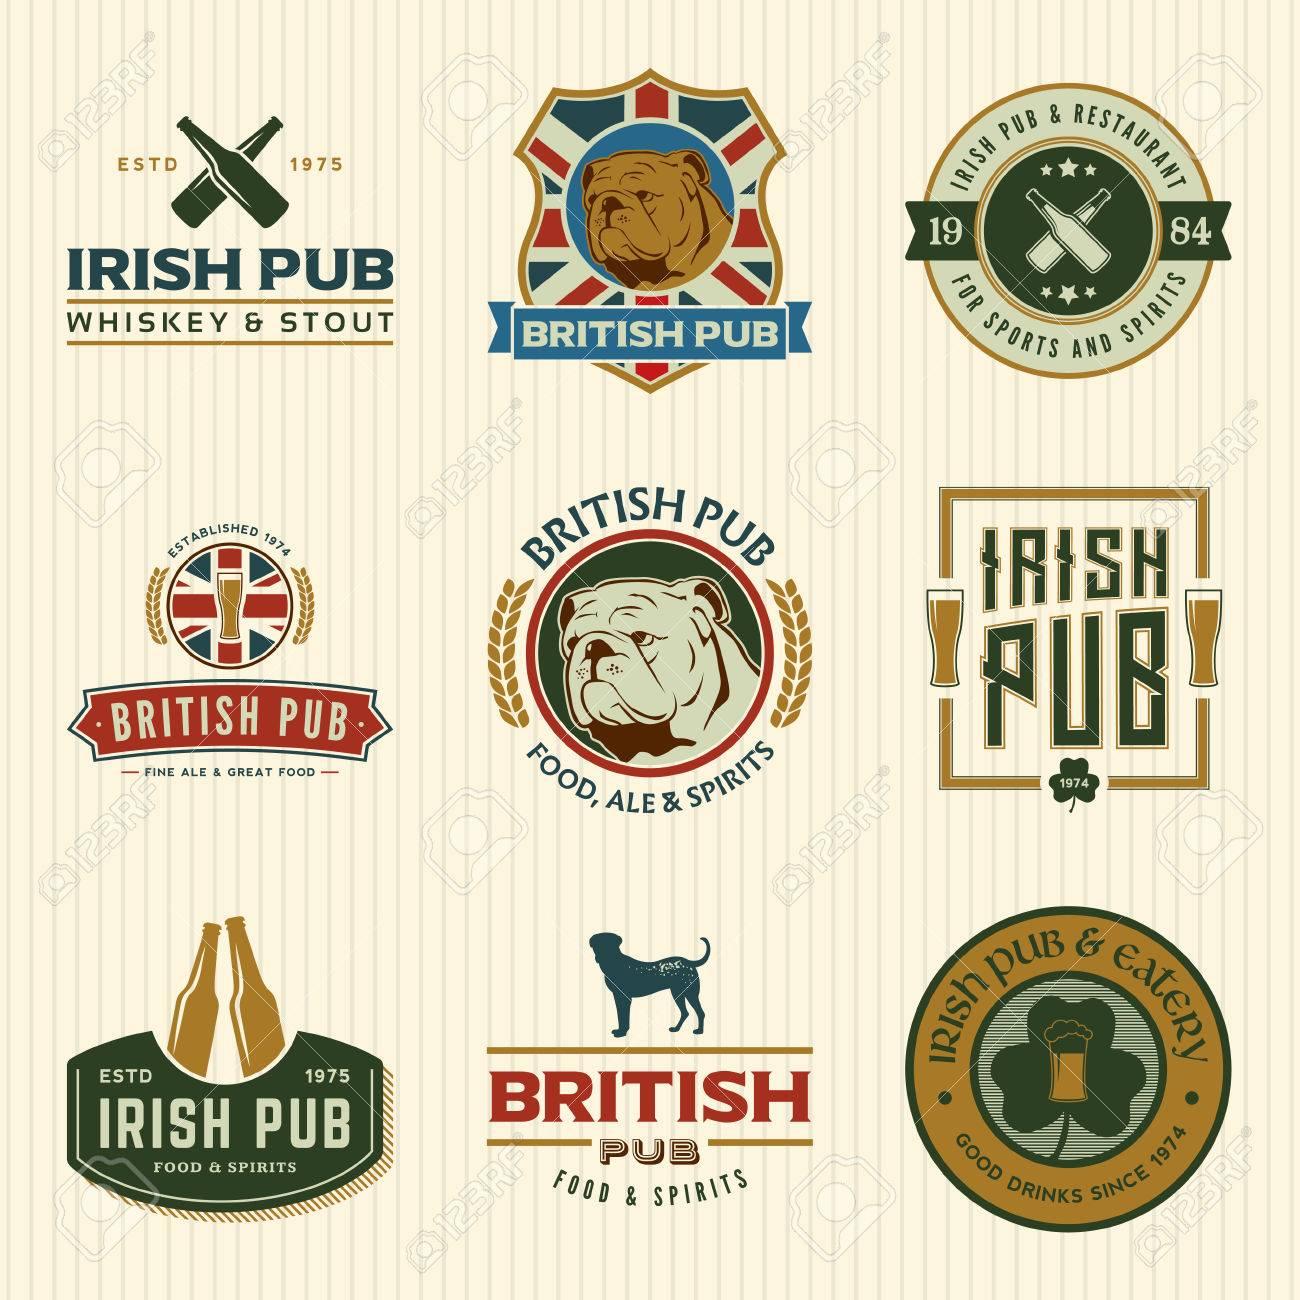 vector set of irish and british pub labels, badges and design elements - 42584452